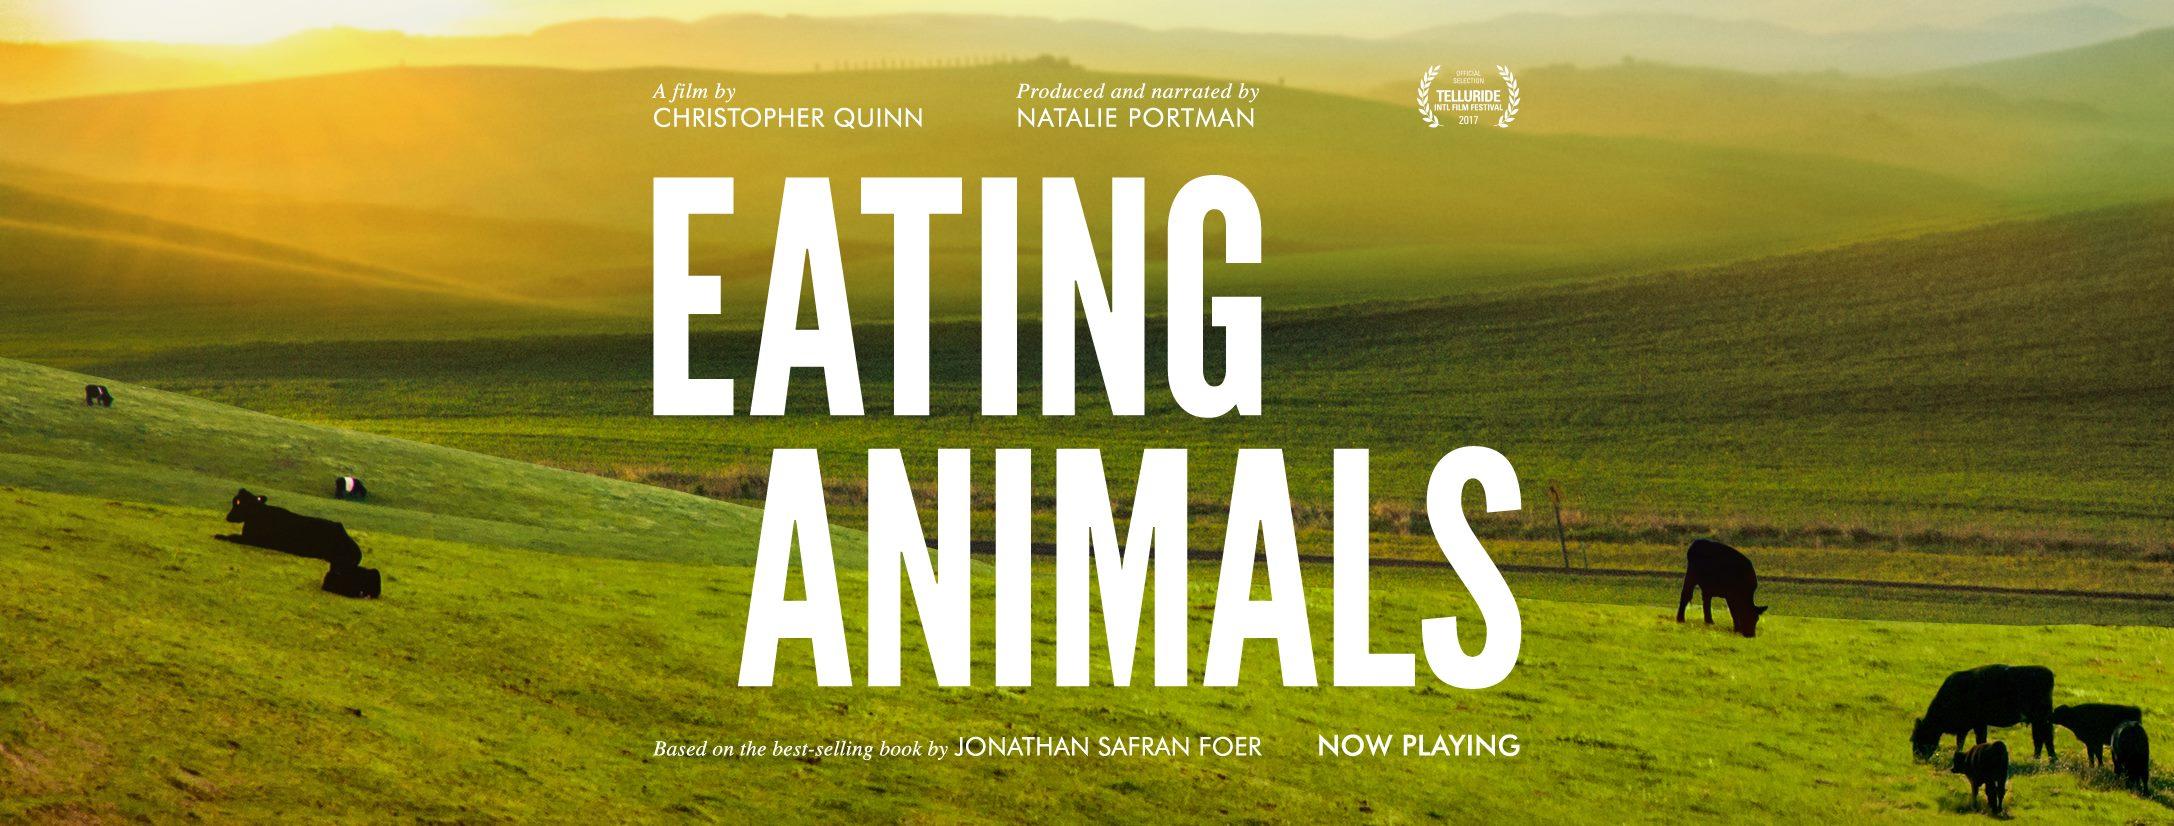 Eating Animals: เบื้องหลังอุตสาหกรรมการผลิตเนื้อสัตว์ที่ทำร้ายทุกชีวิตบนโลก